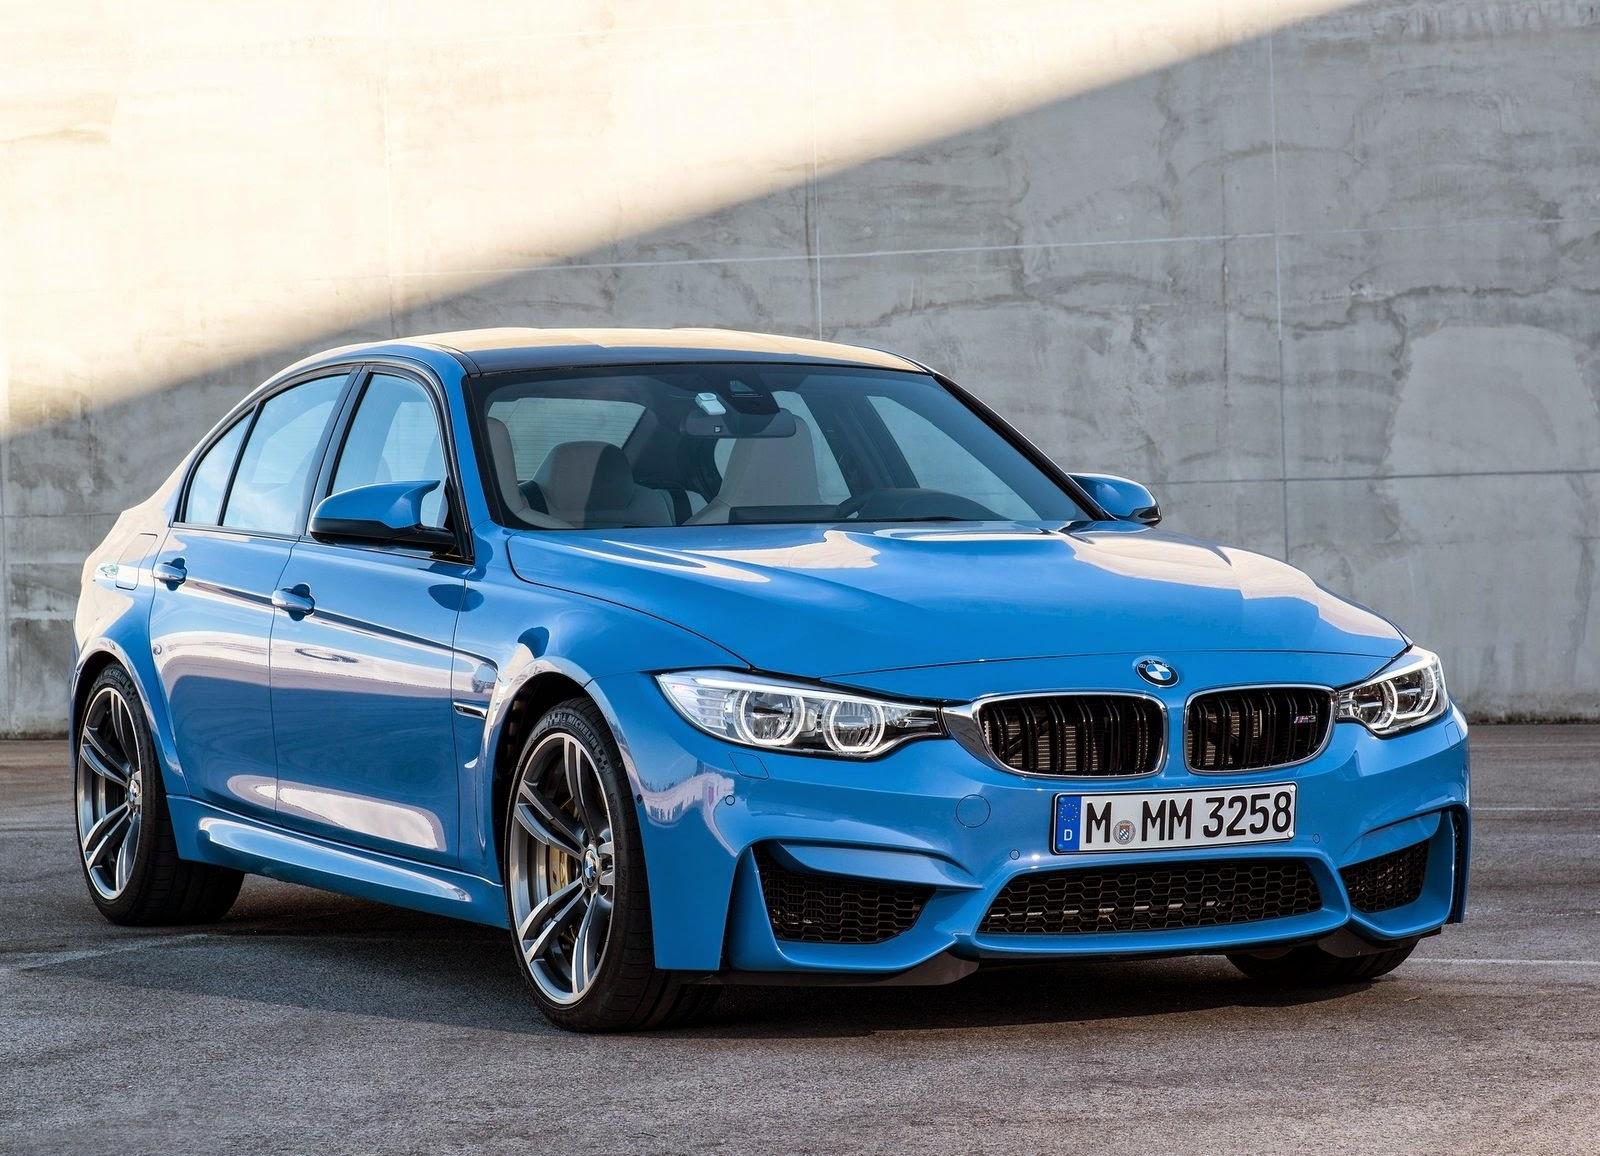 BMW M3 Sedan Blue 2015 Car Wallpaper Stylish Cars HD Wallpapers